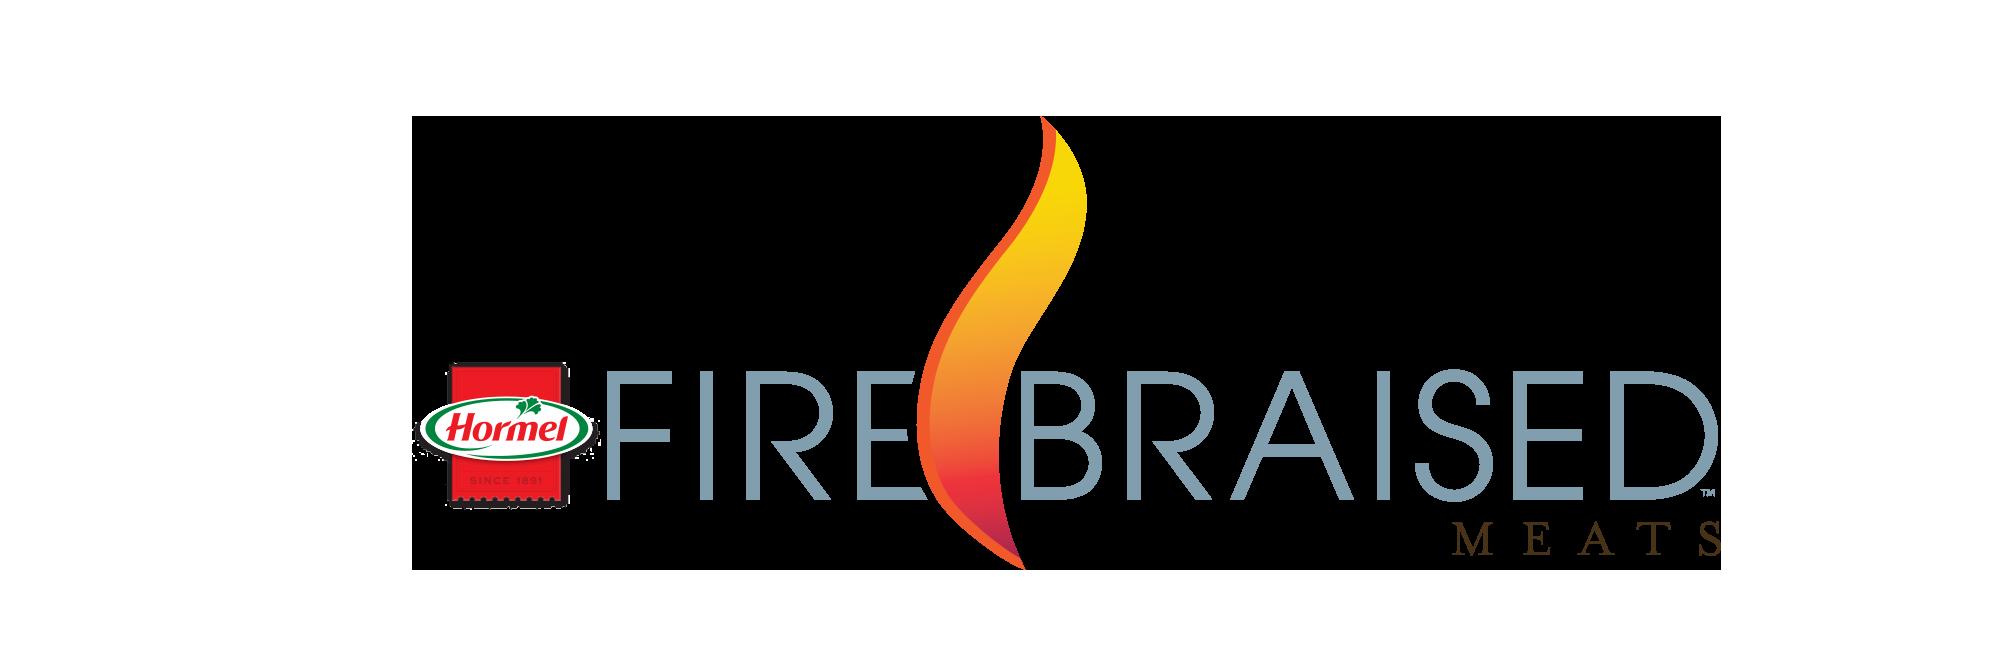 Hormel Fire Braised Meats Header Logo